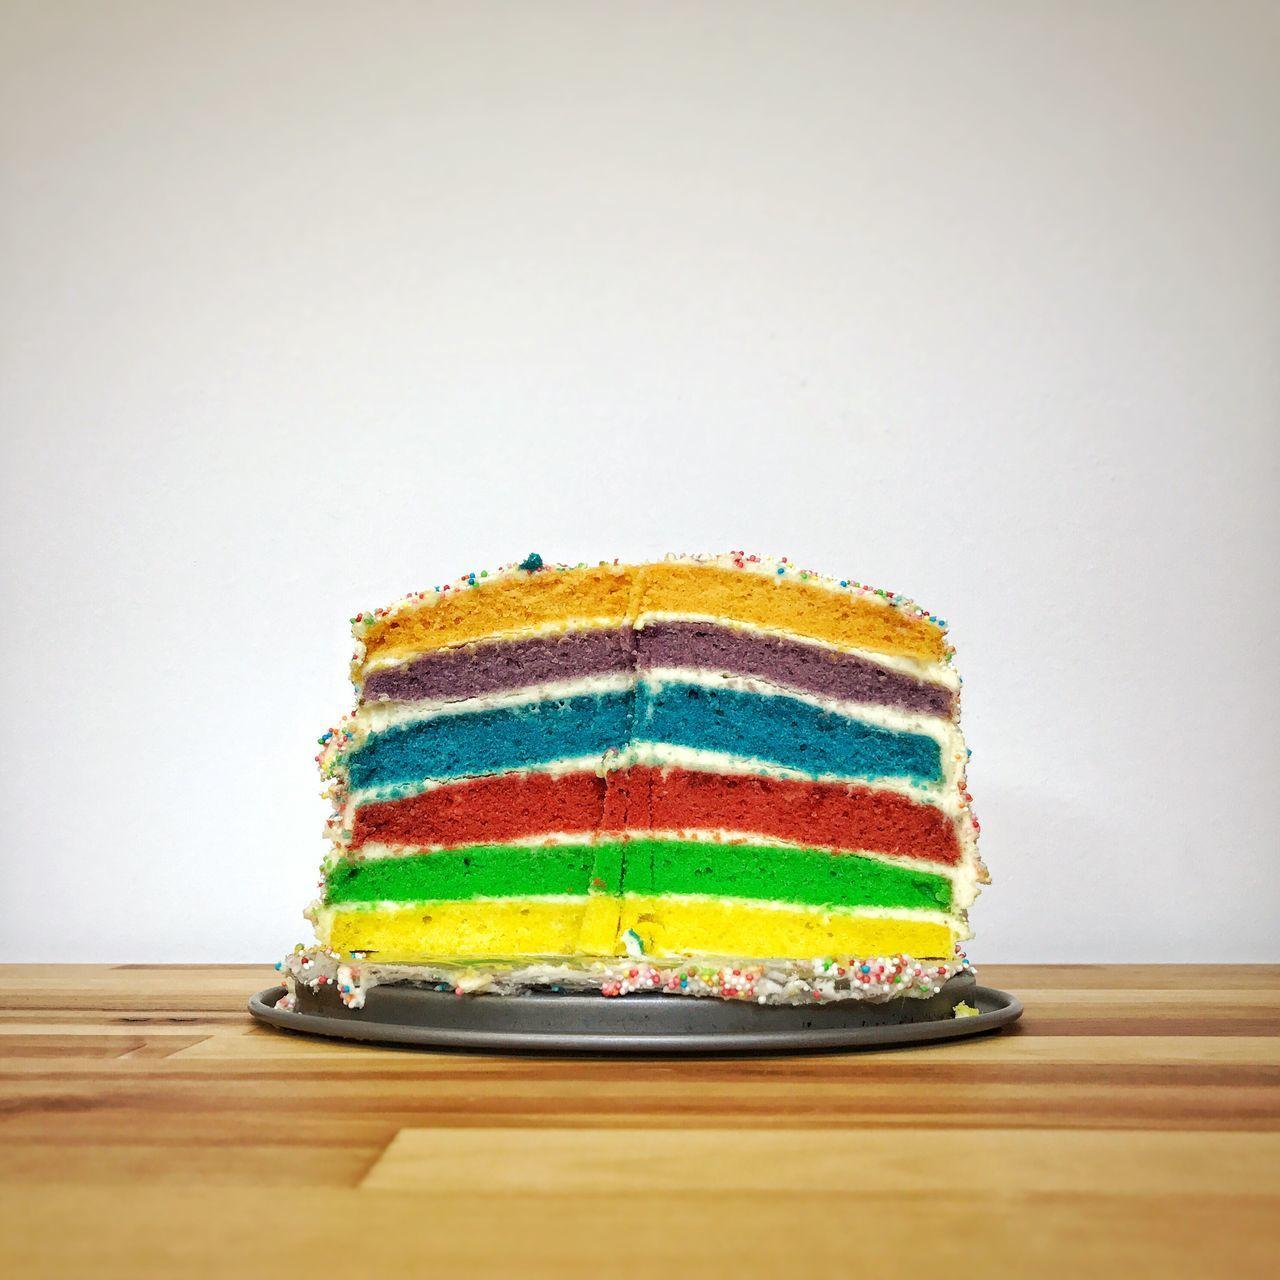 Colorfull Cake Whitewall Sweet VariousColors EyeEm Diversity